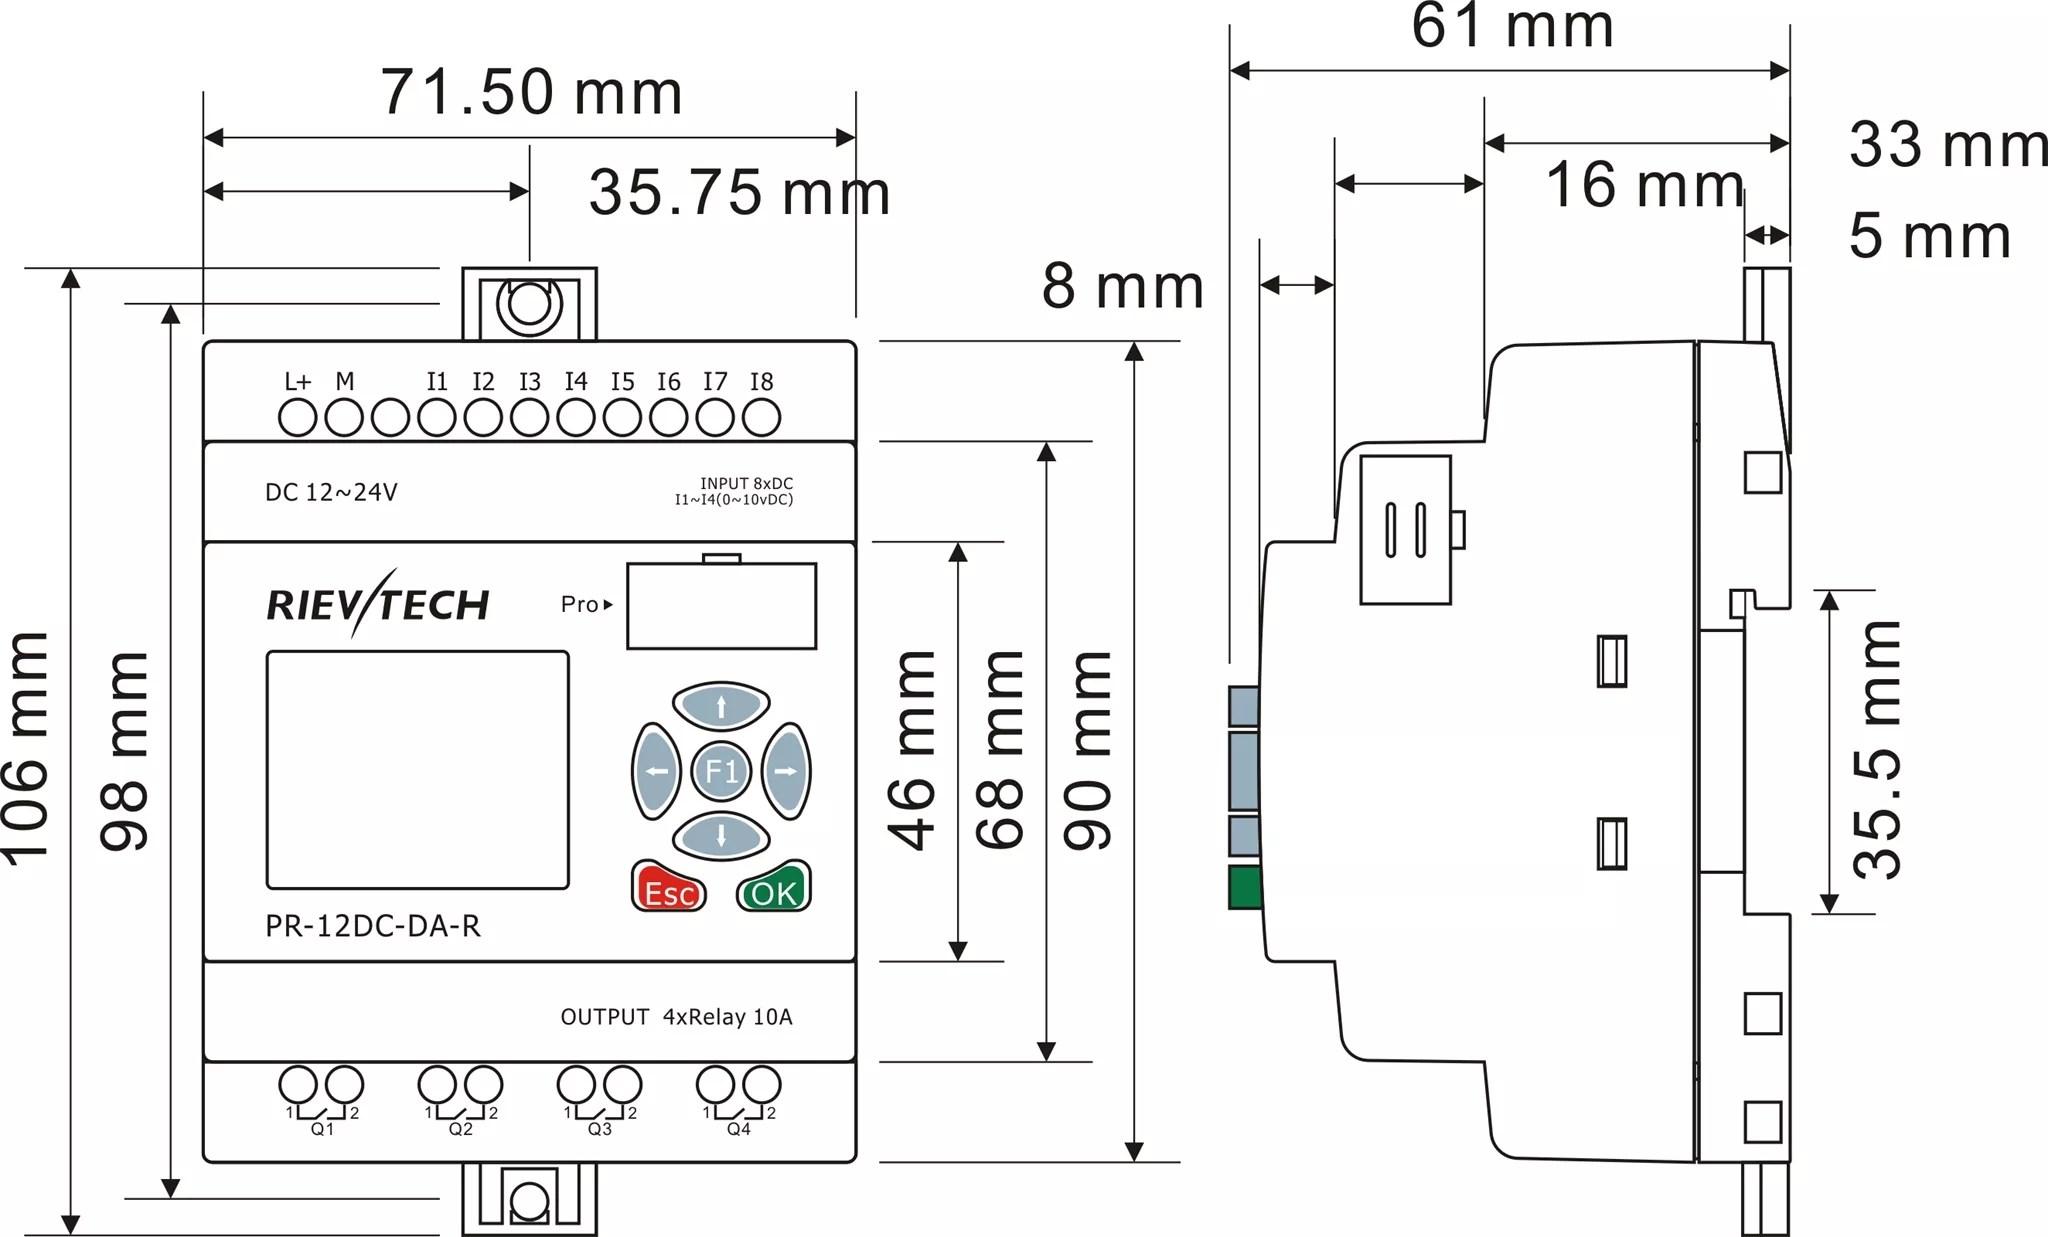 wiring diagram plc siemens ez loader trailer pr 12dc da r buy micro logo intelligent